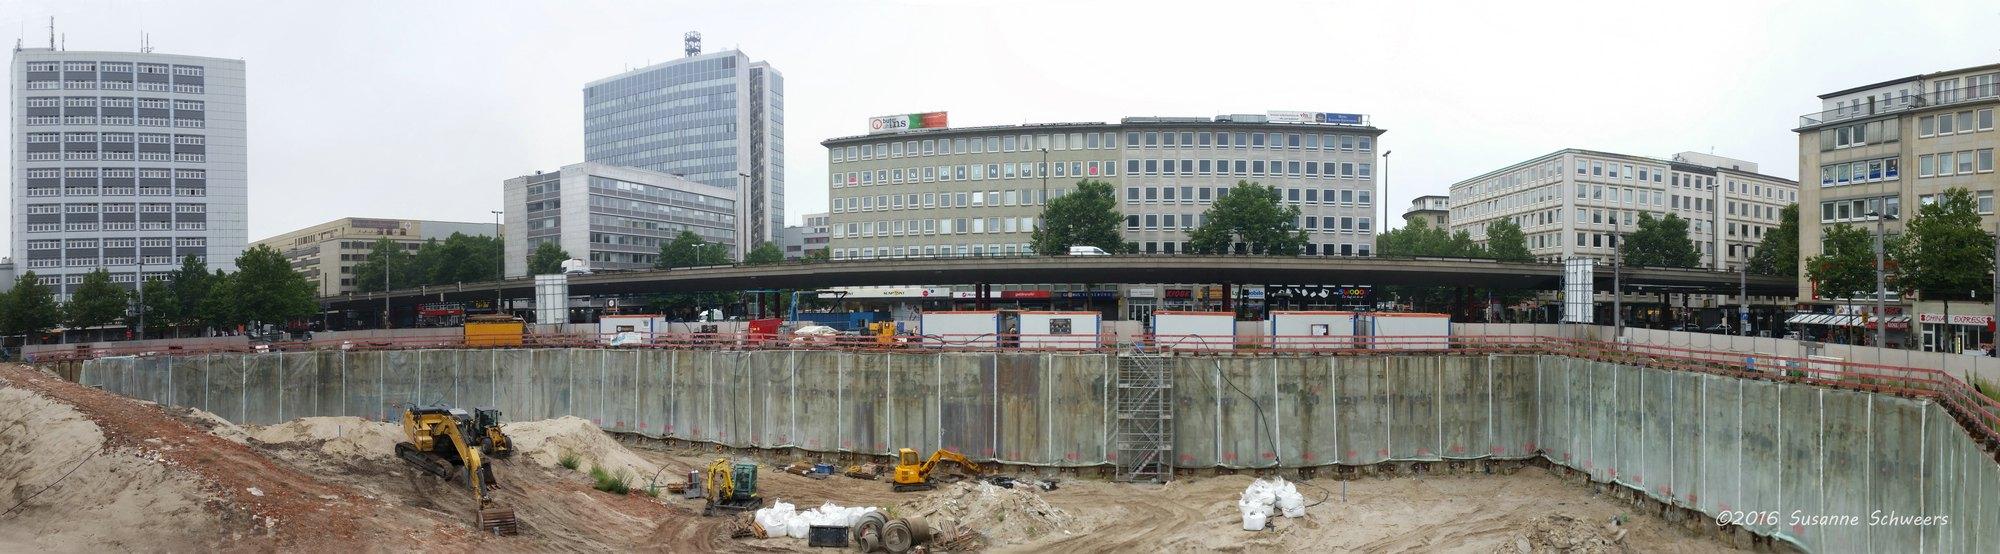 Baustelle Bahnhofsplatz 69